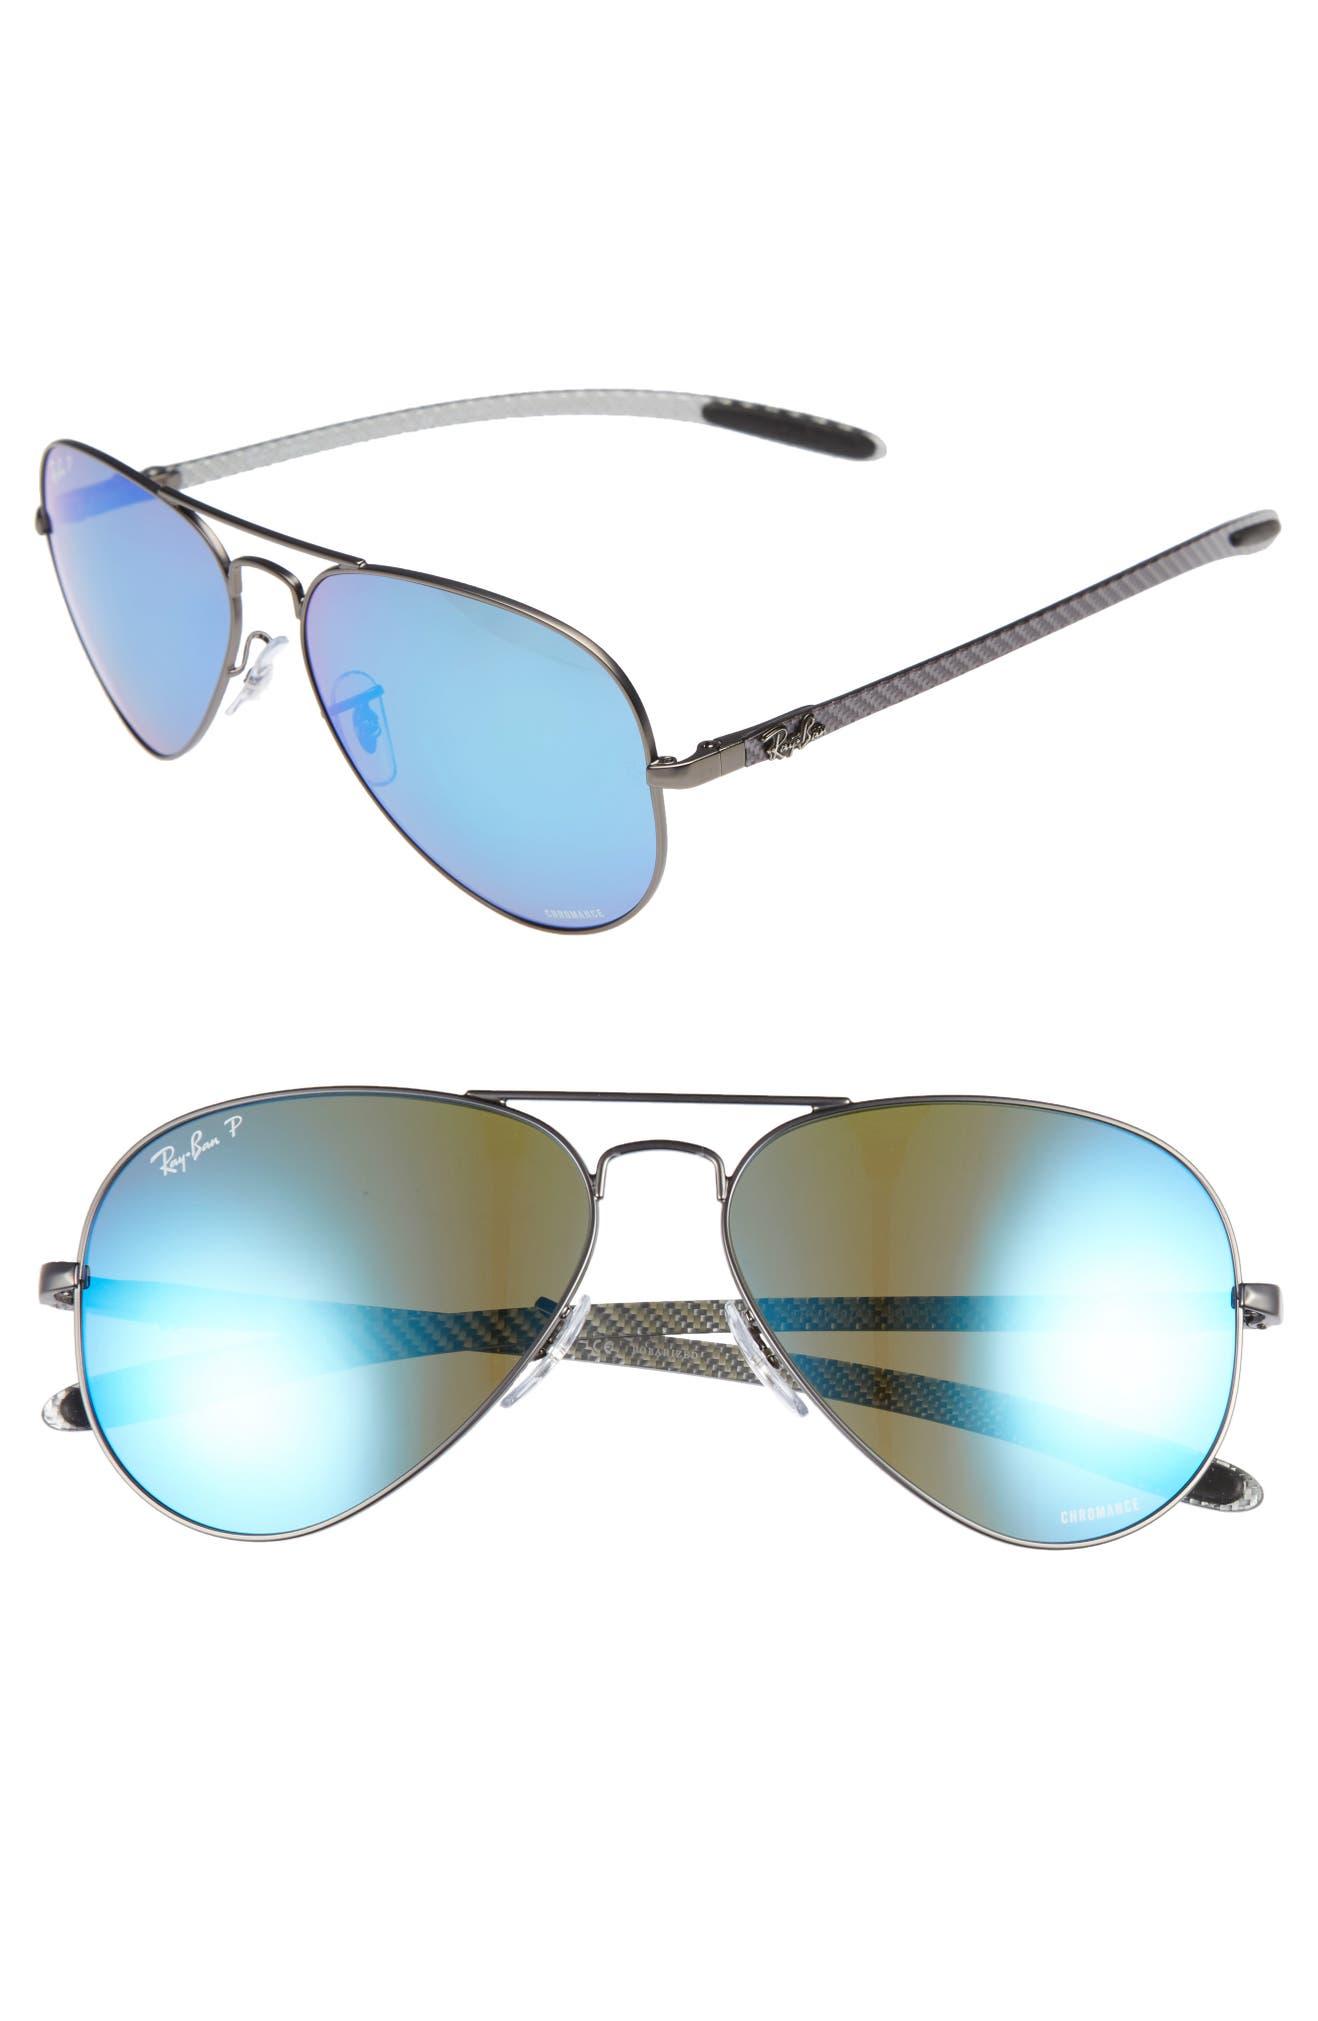 78325f8ebab Ray-Ban Chromance 58mm Polarized Aviator Sunglasses